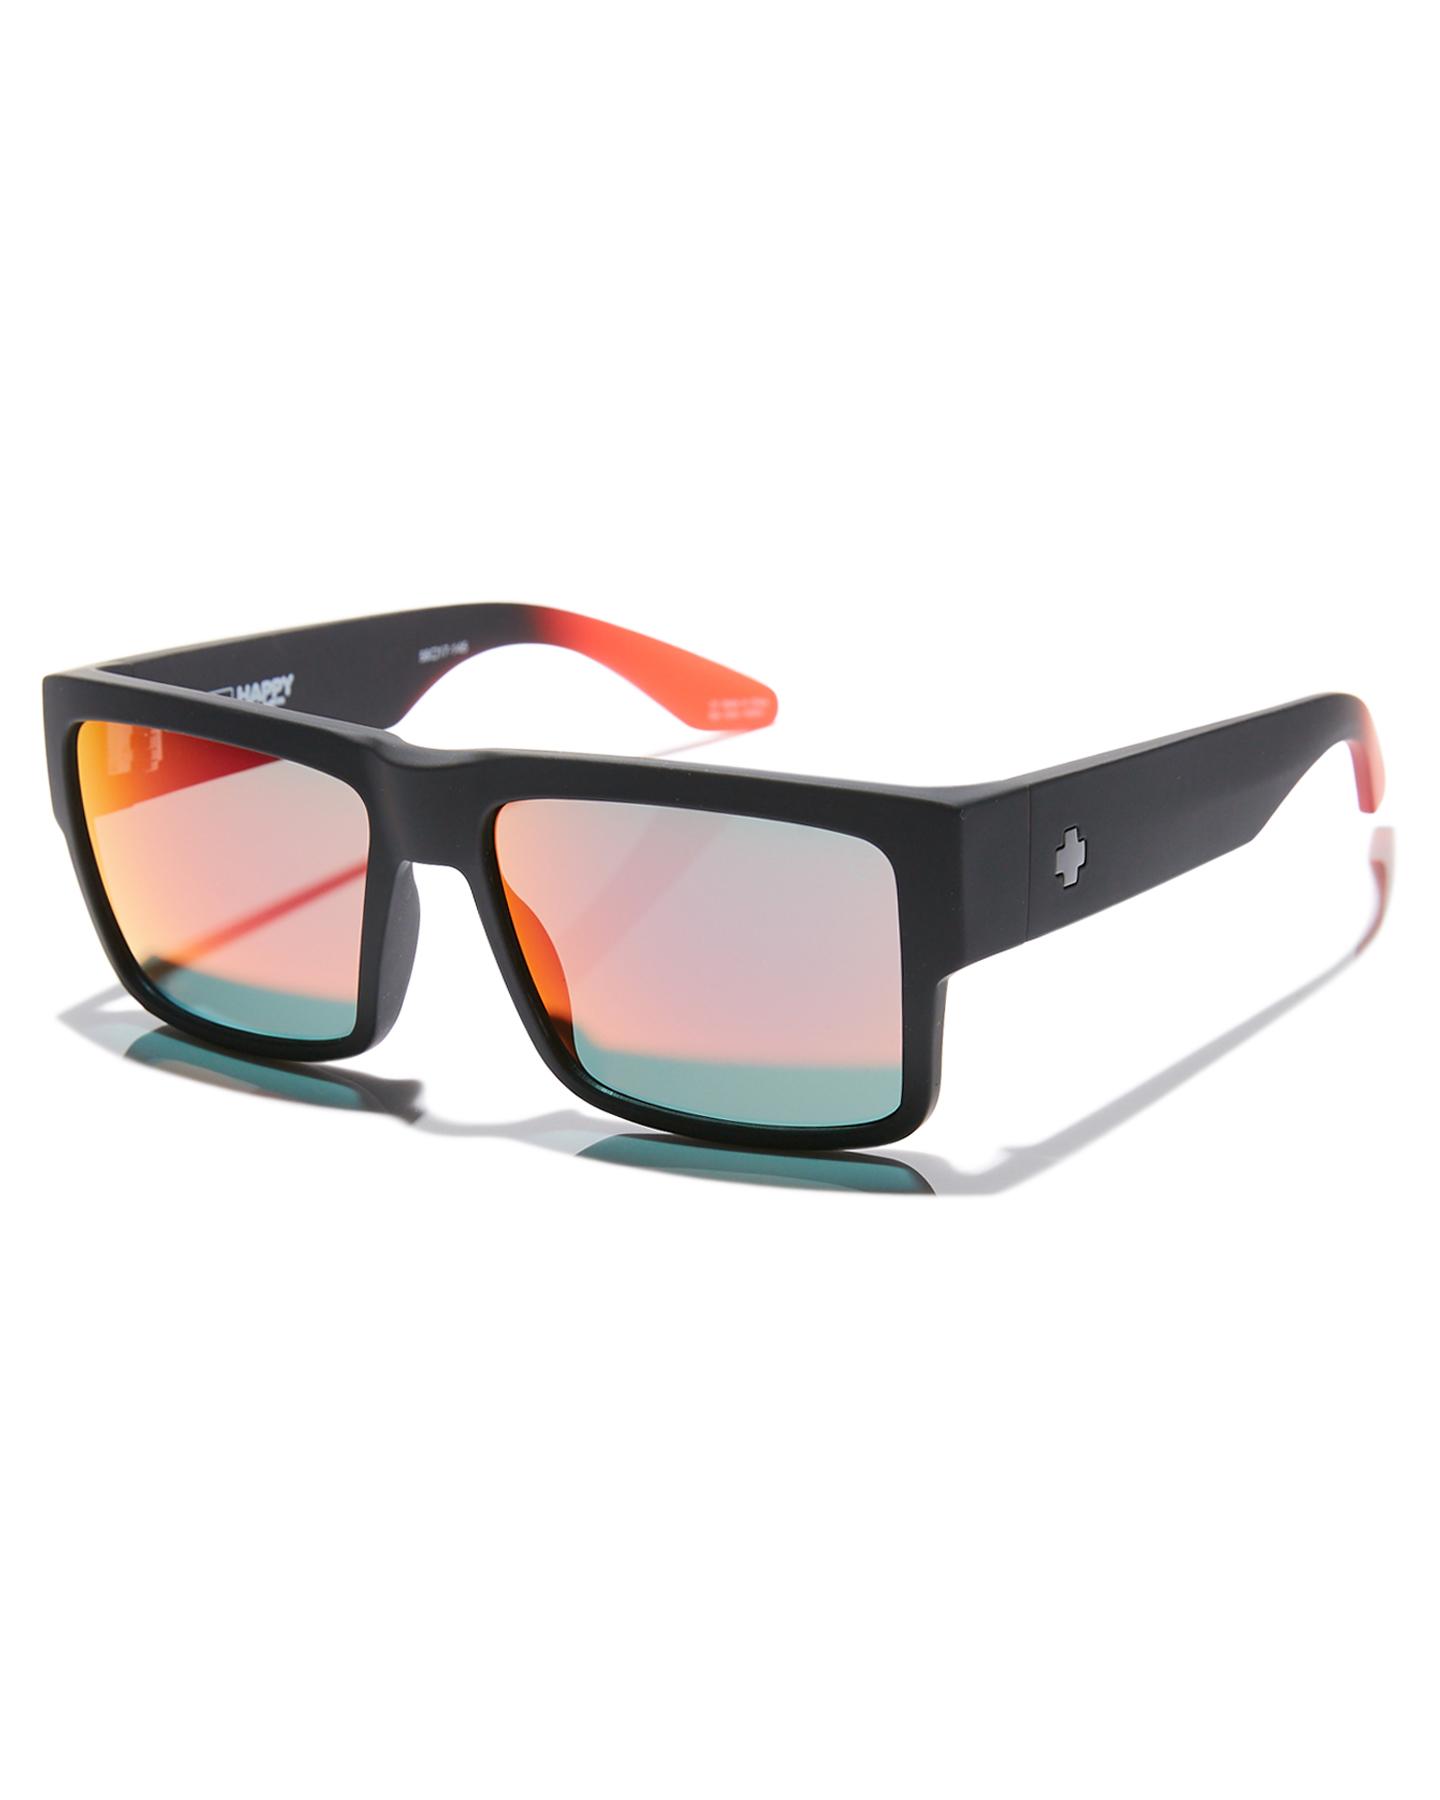 a5fc194d9b Spy Cyrus Happy Lens Sunglasses Soft Matte Black Mens sunglasses ...